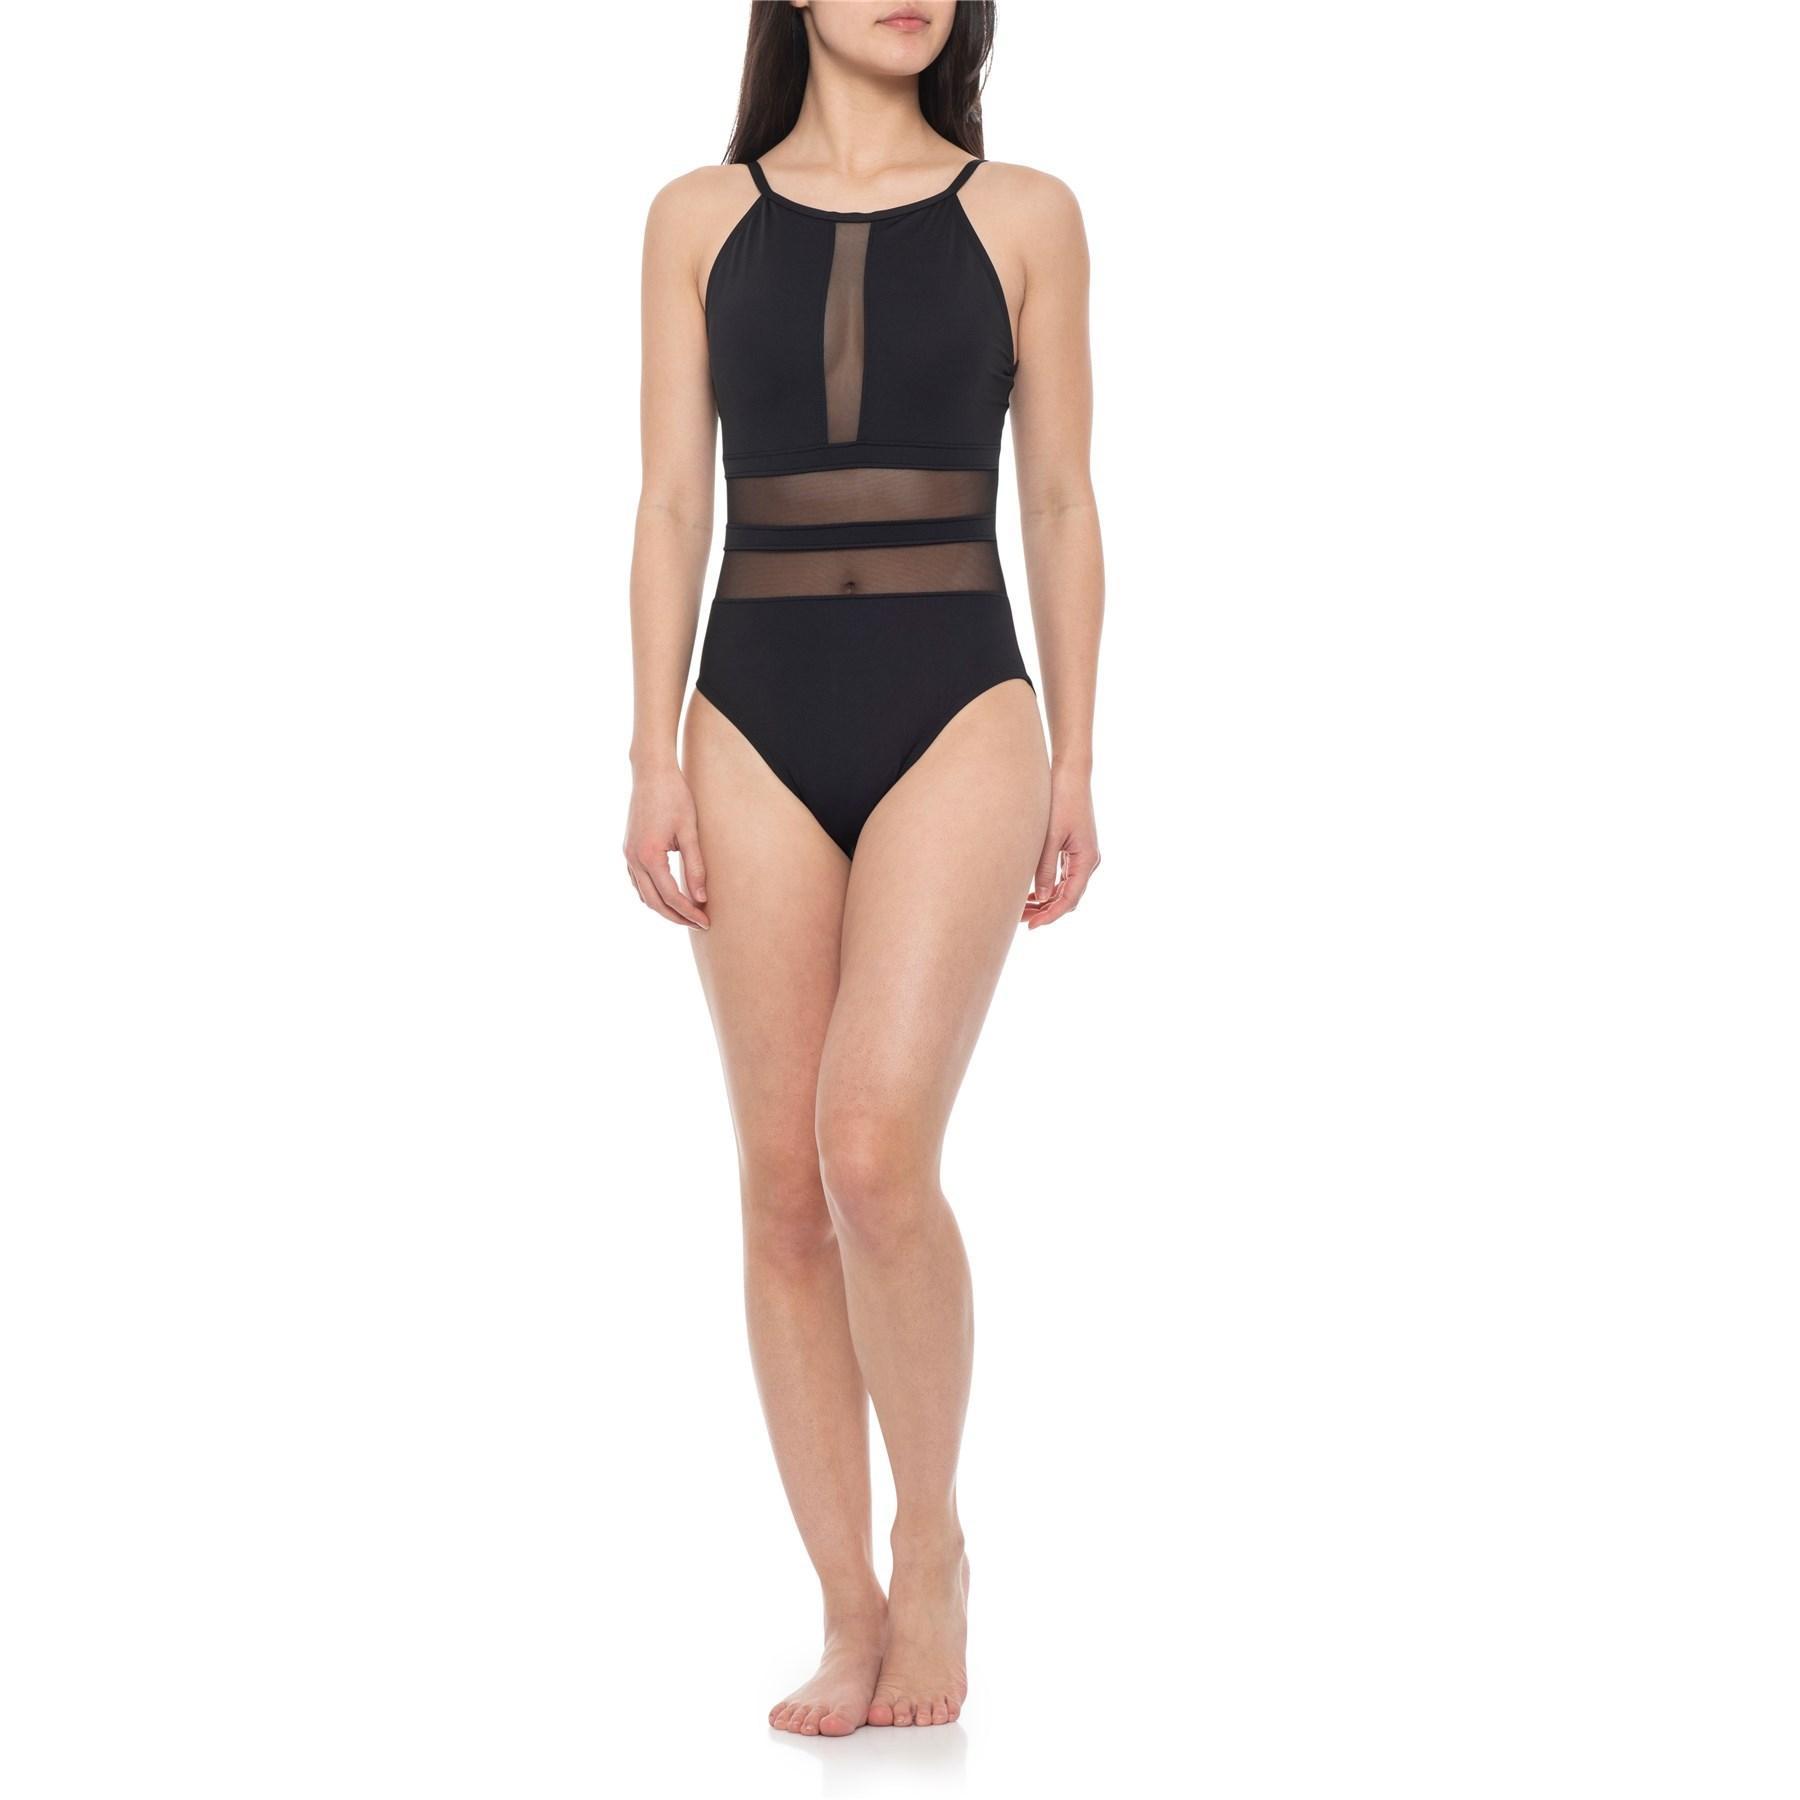 9d47896db Lyst - La Blanca Mesh High-neck One-piece Swimsuit in Black